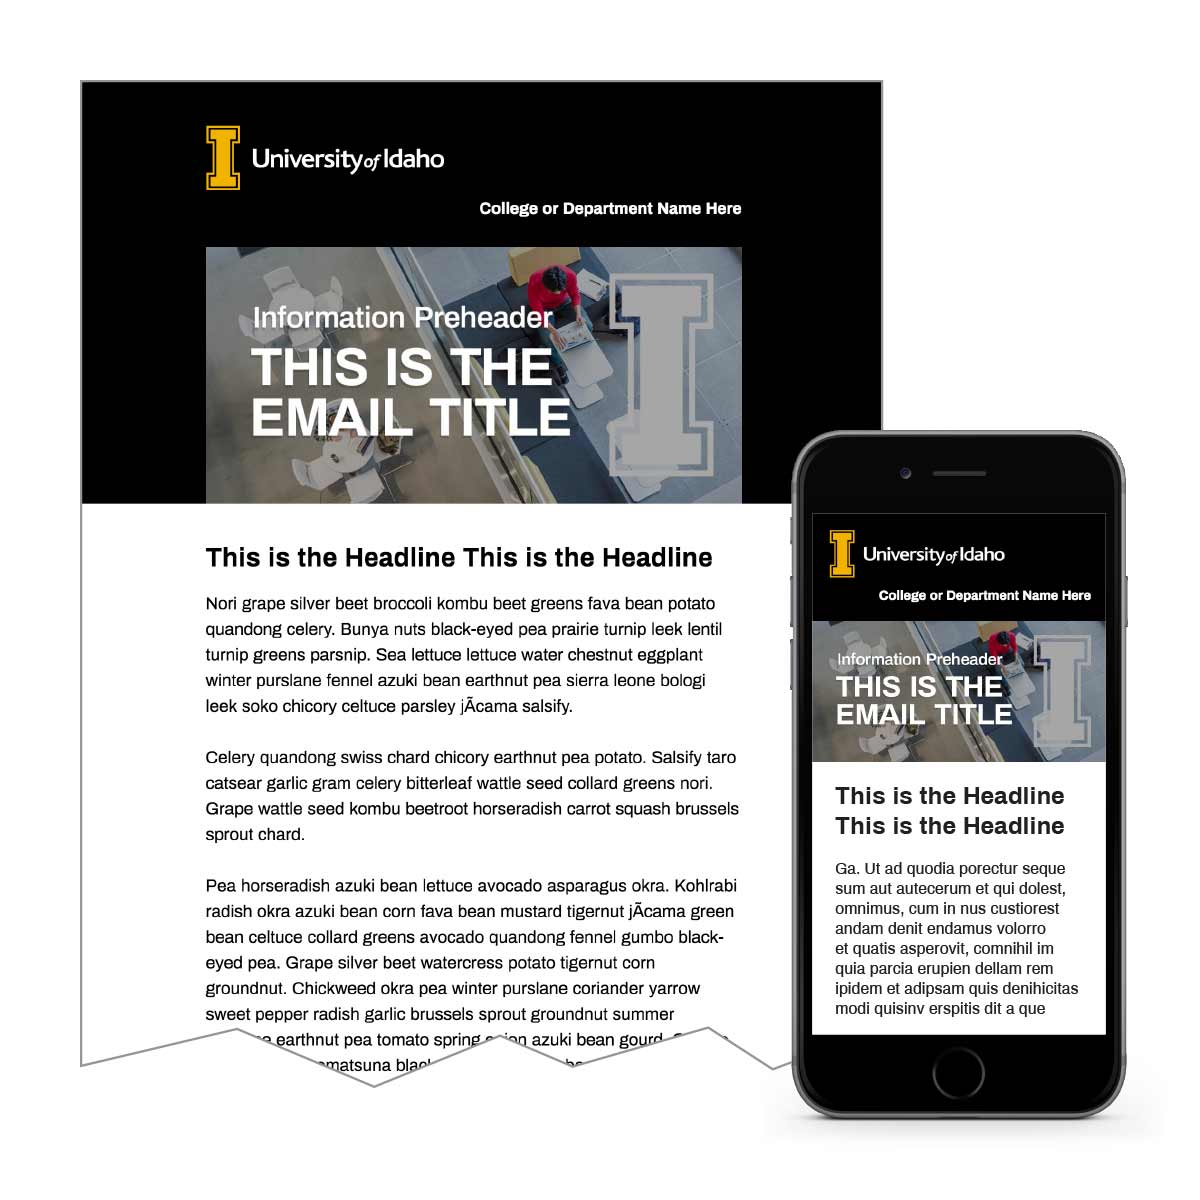 University of Idaho Email Guidelines